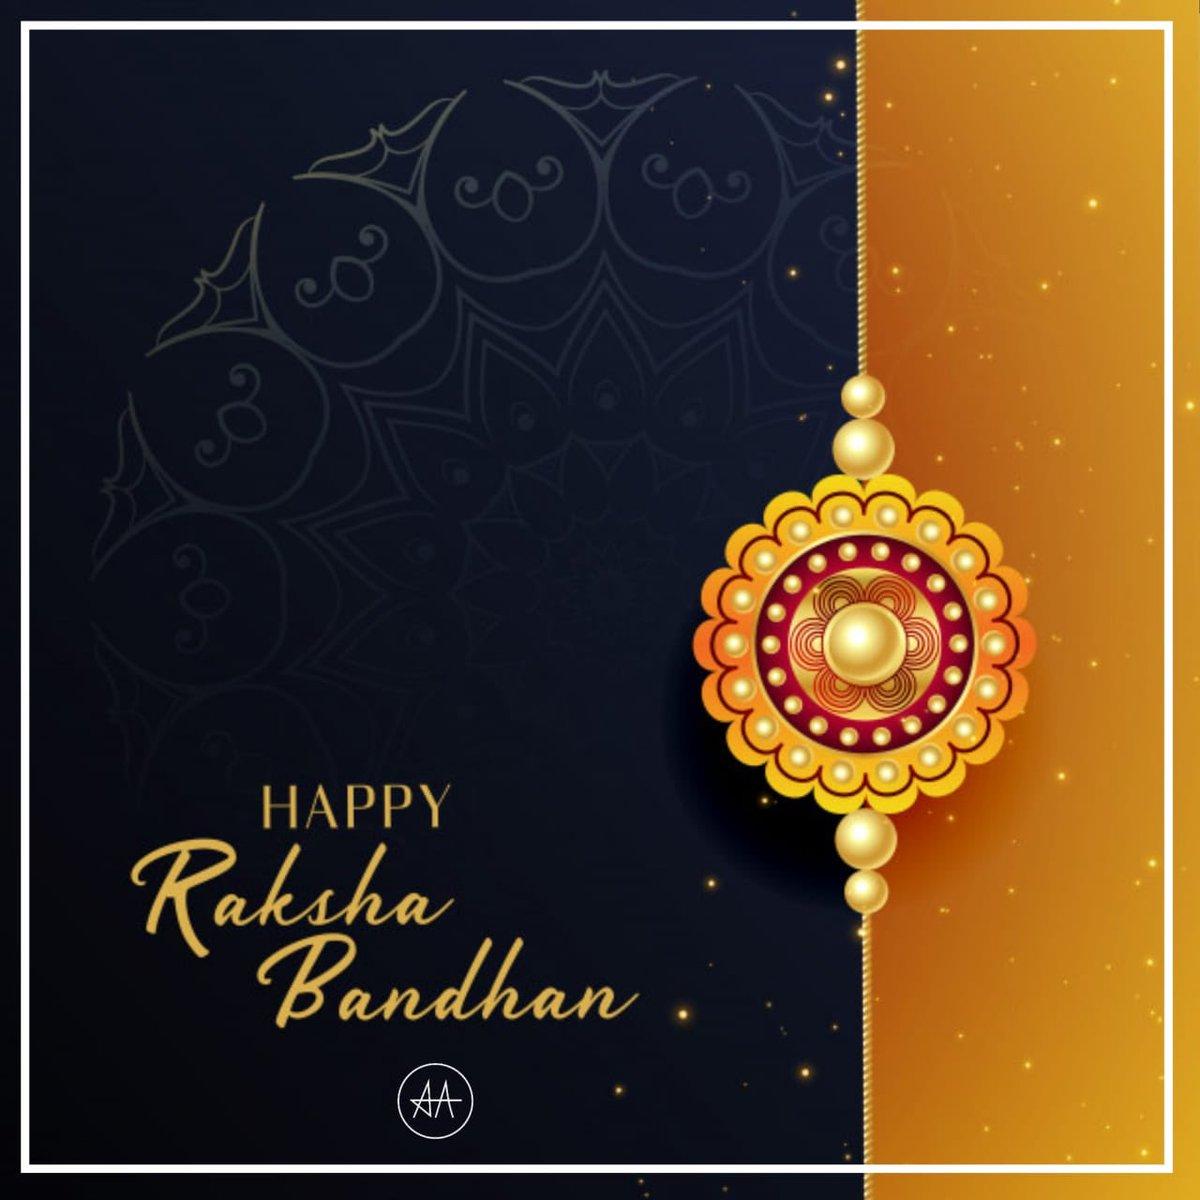 Happy Raksha Bandhan https://t.co/b28TxhezSB